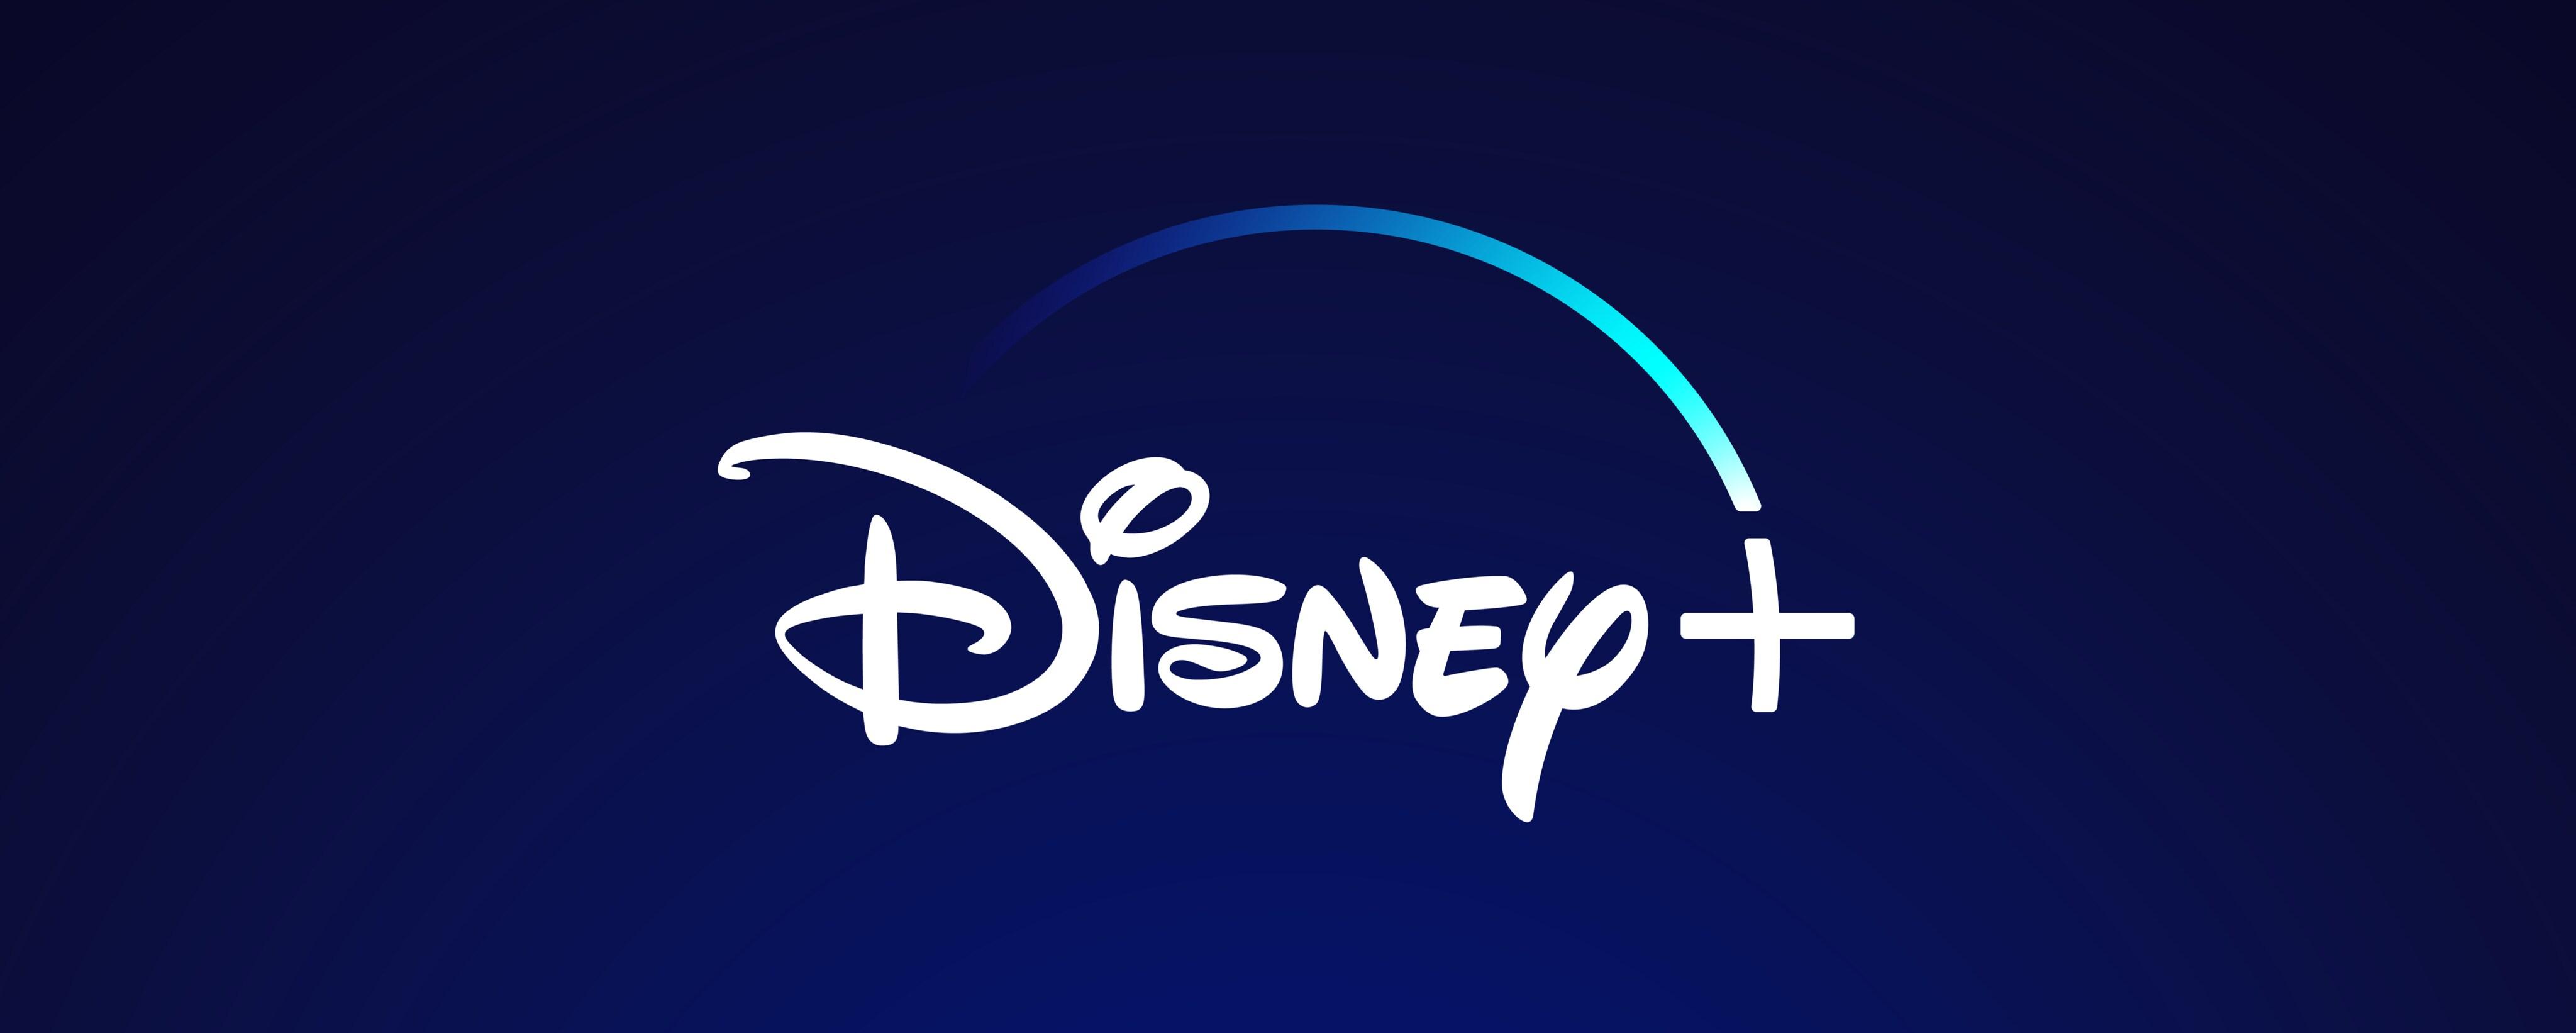 Next on Disney+: July 2020